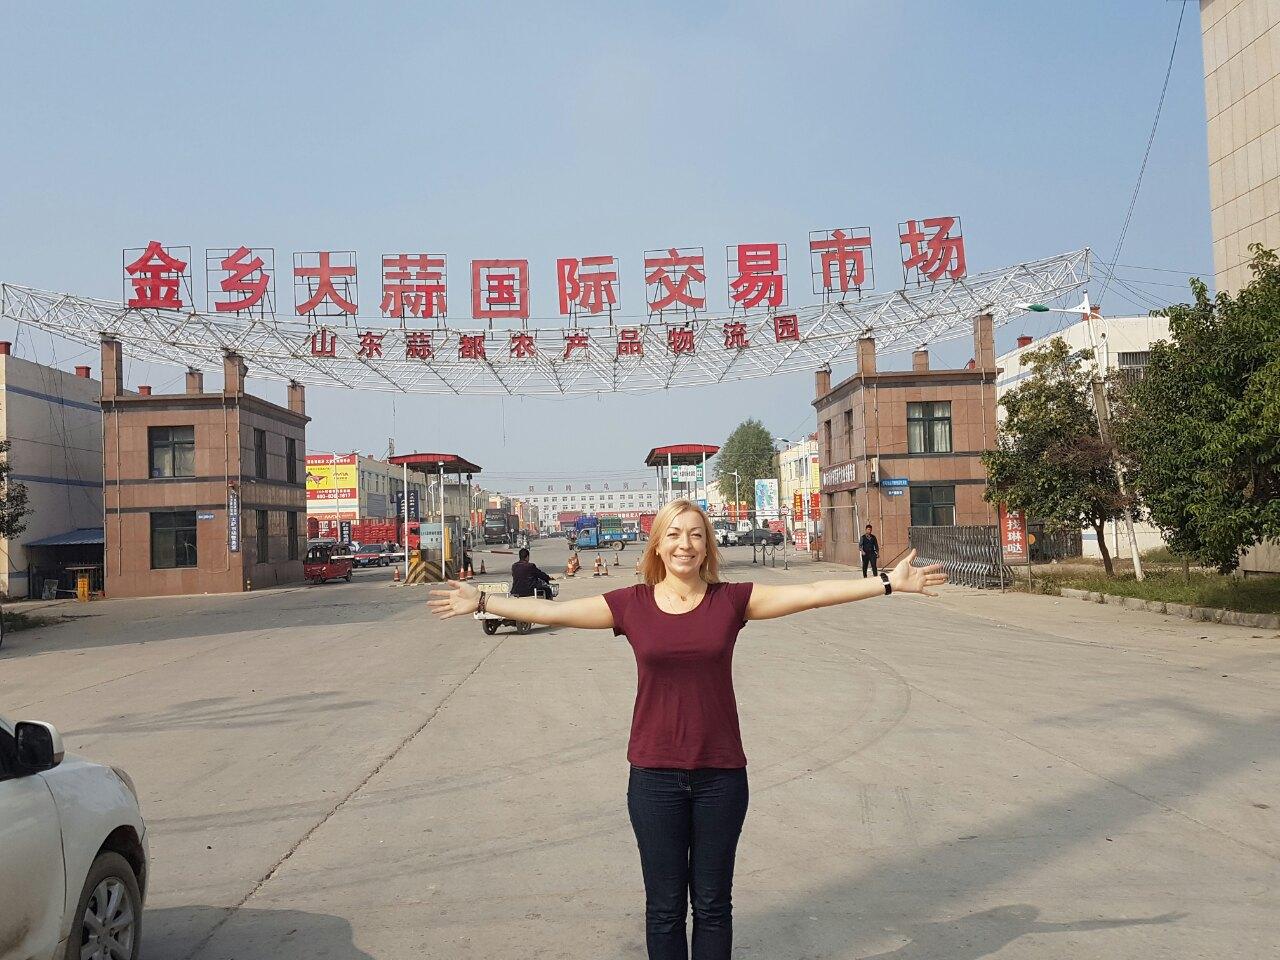 ринок часнику в Китаї, Шандунь, Цзиньсян